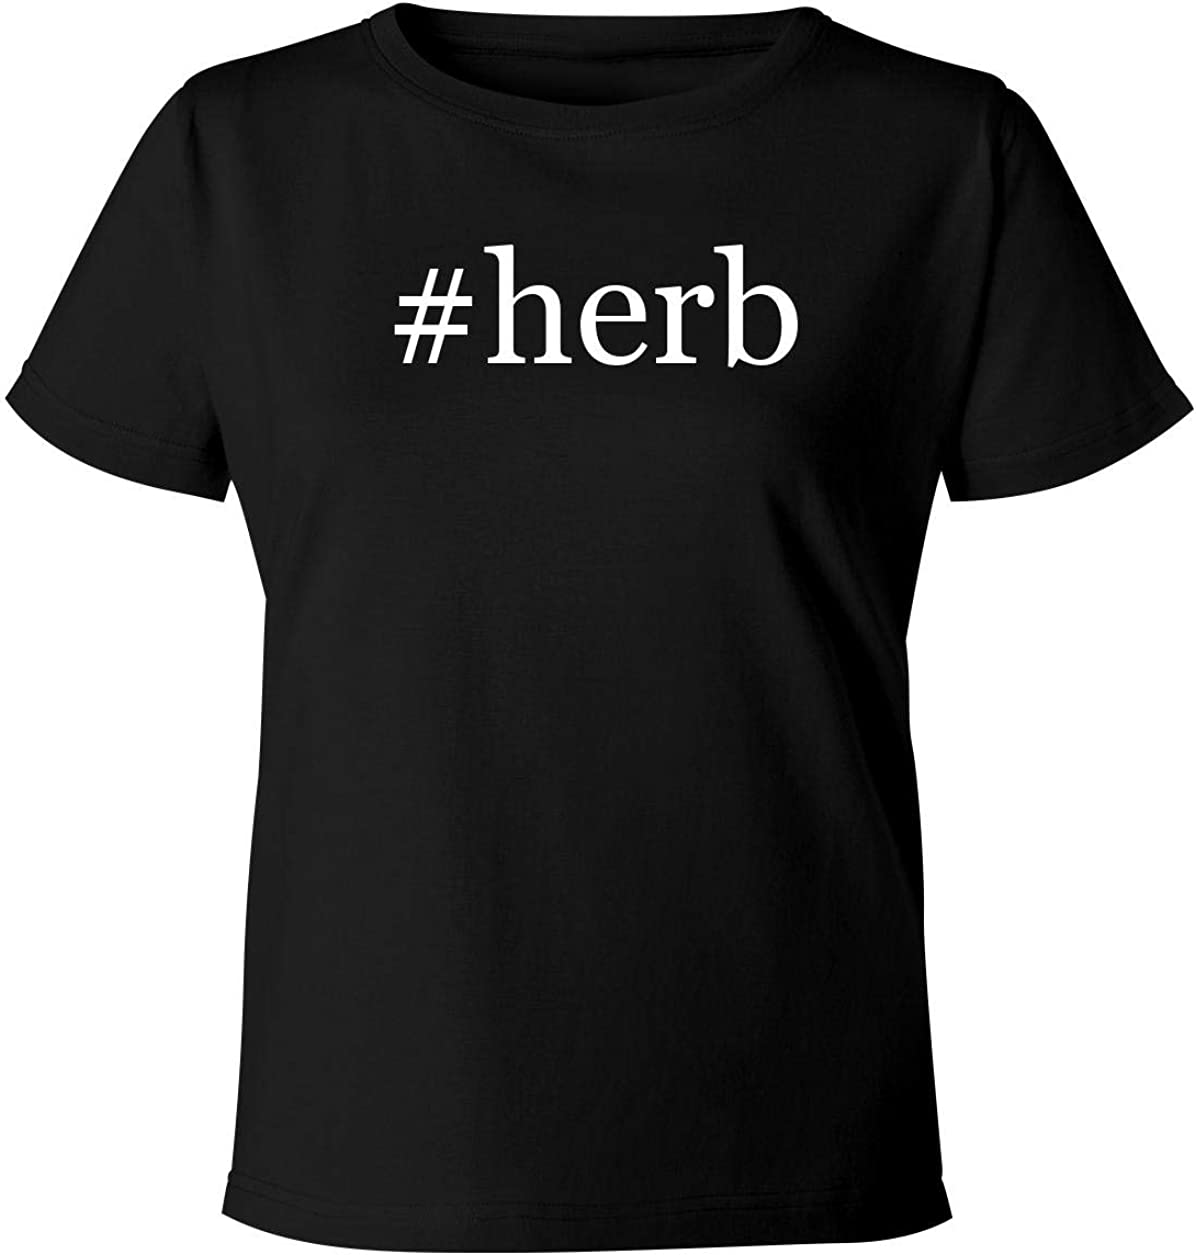 #herb - Women's Soft & Comfortable Hashtag Misses Cut T-Shirt